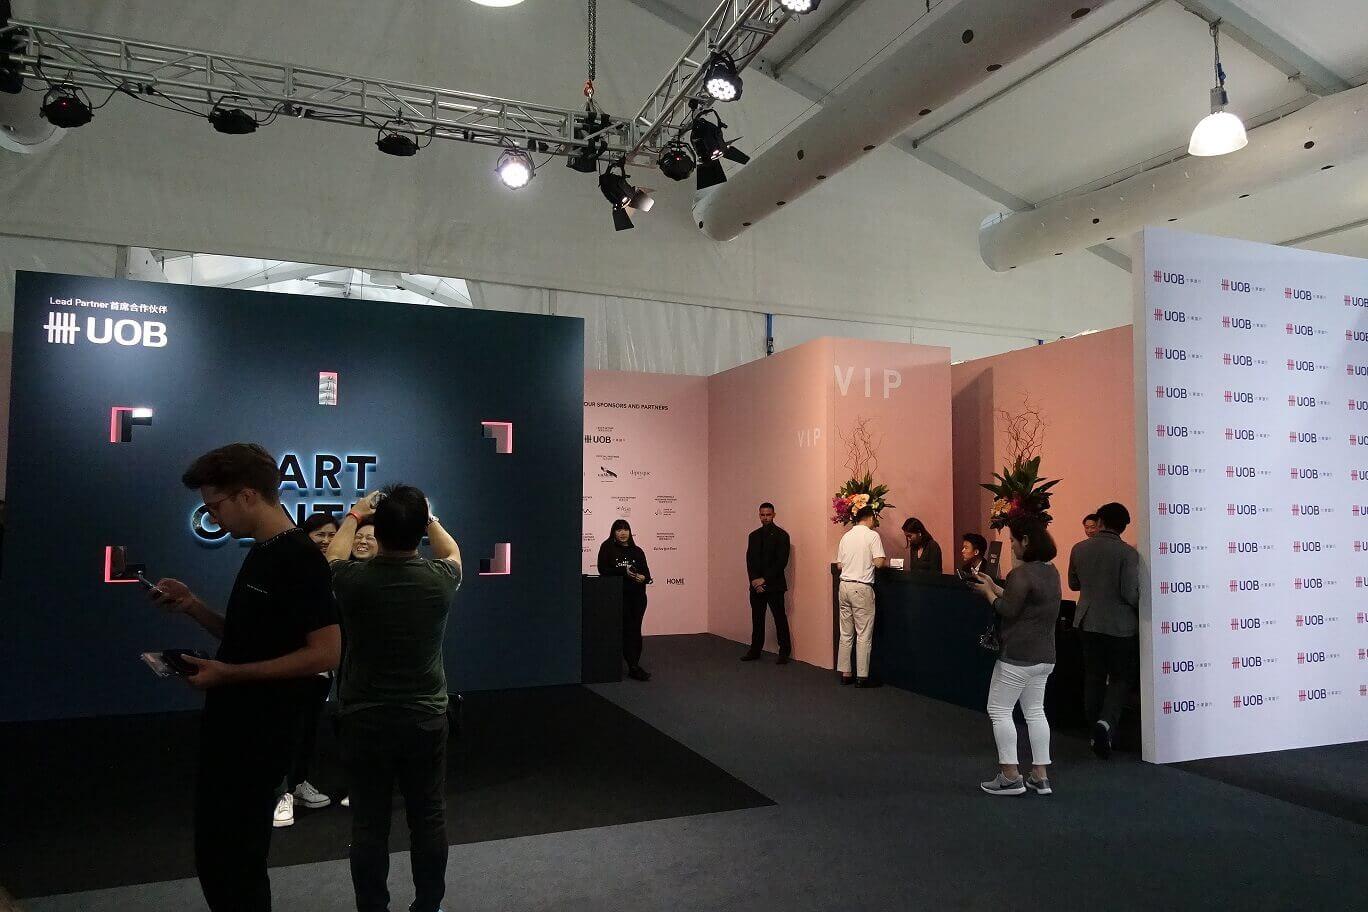 ART CENTRAL 因公共衛生考慮 宣布取消2020展會